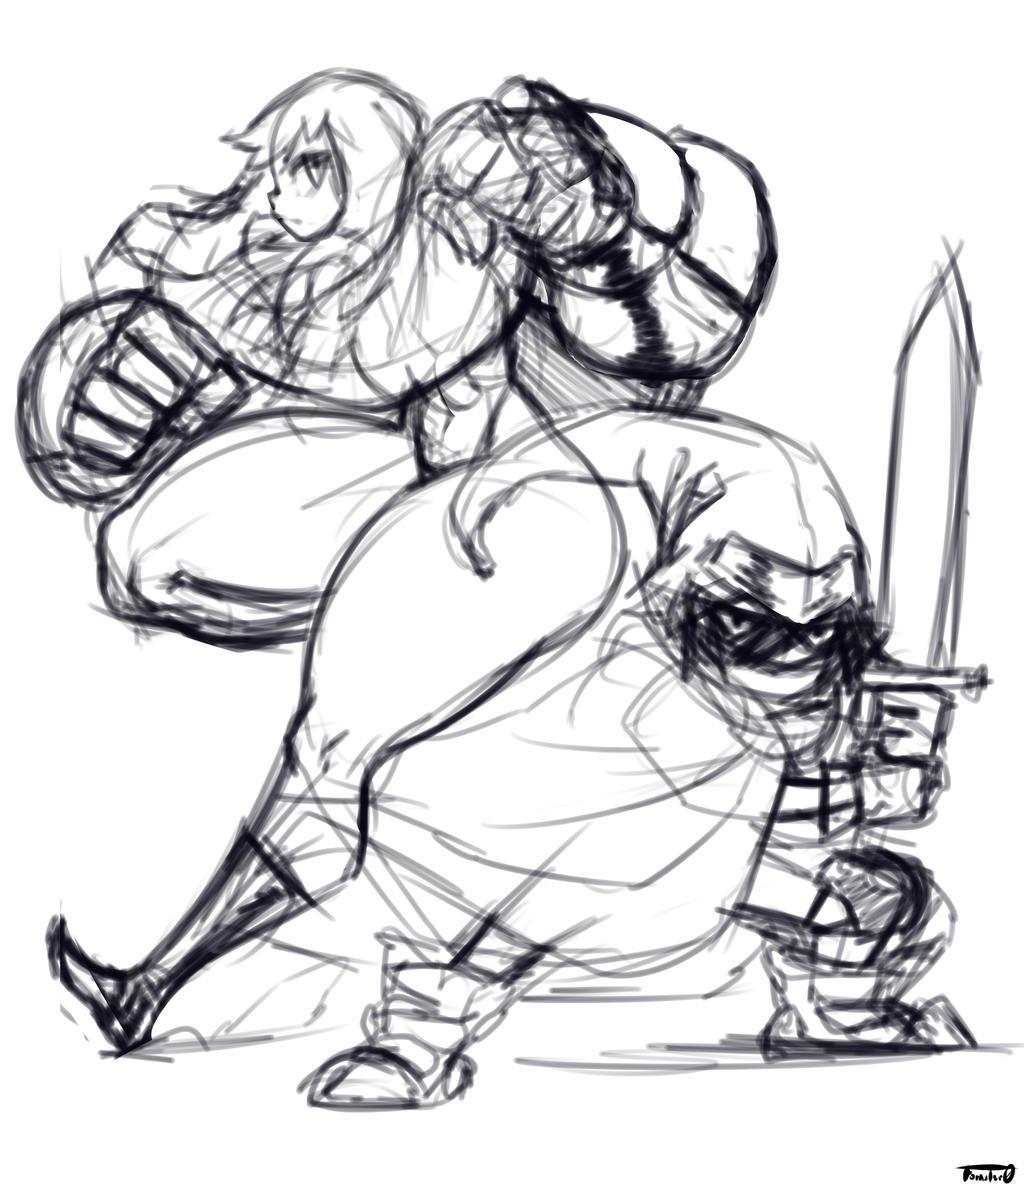 00 Sketch by Foraster0